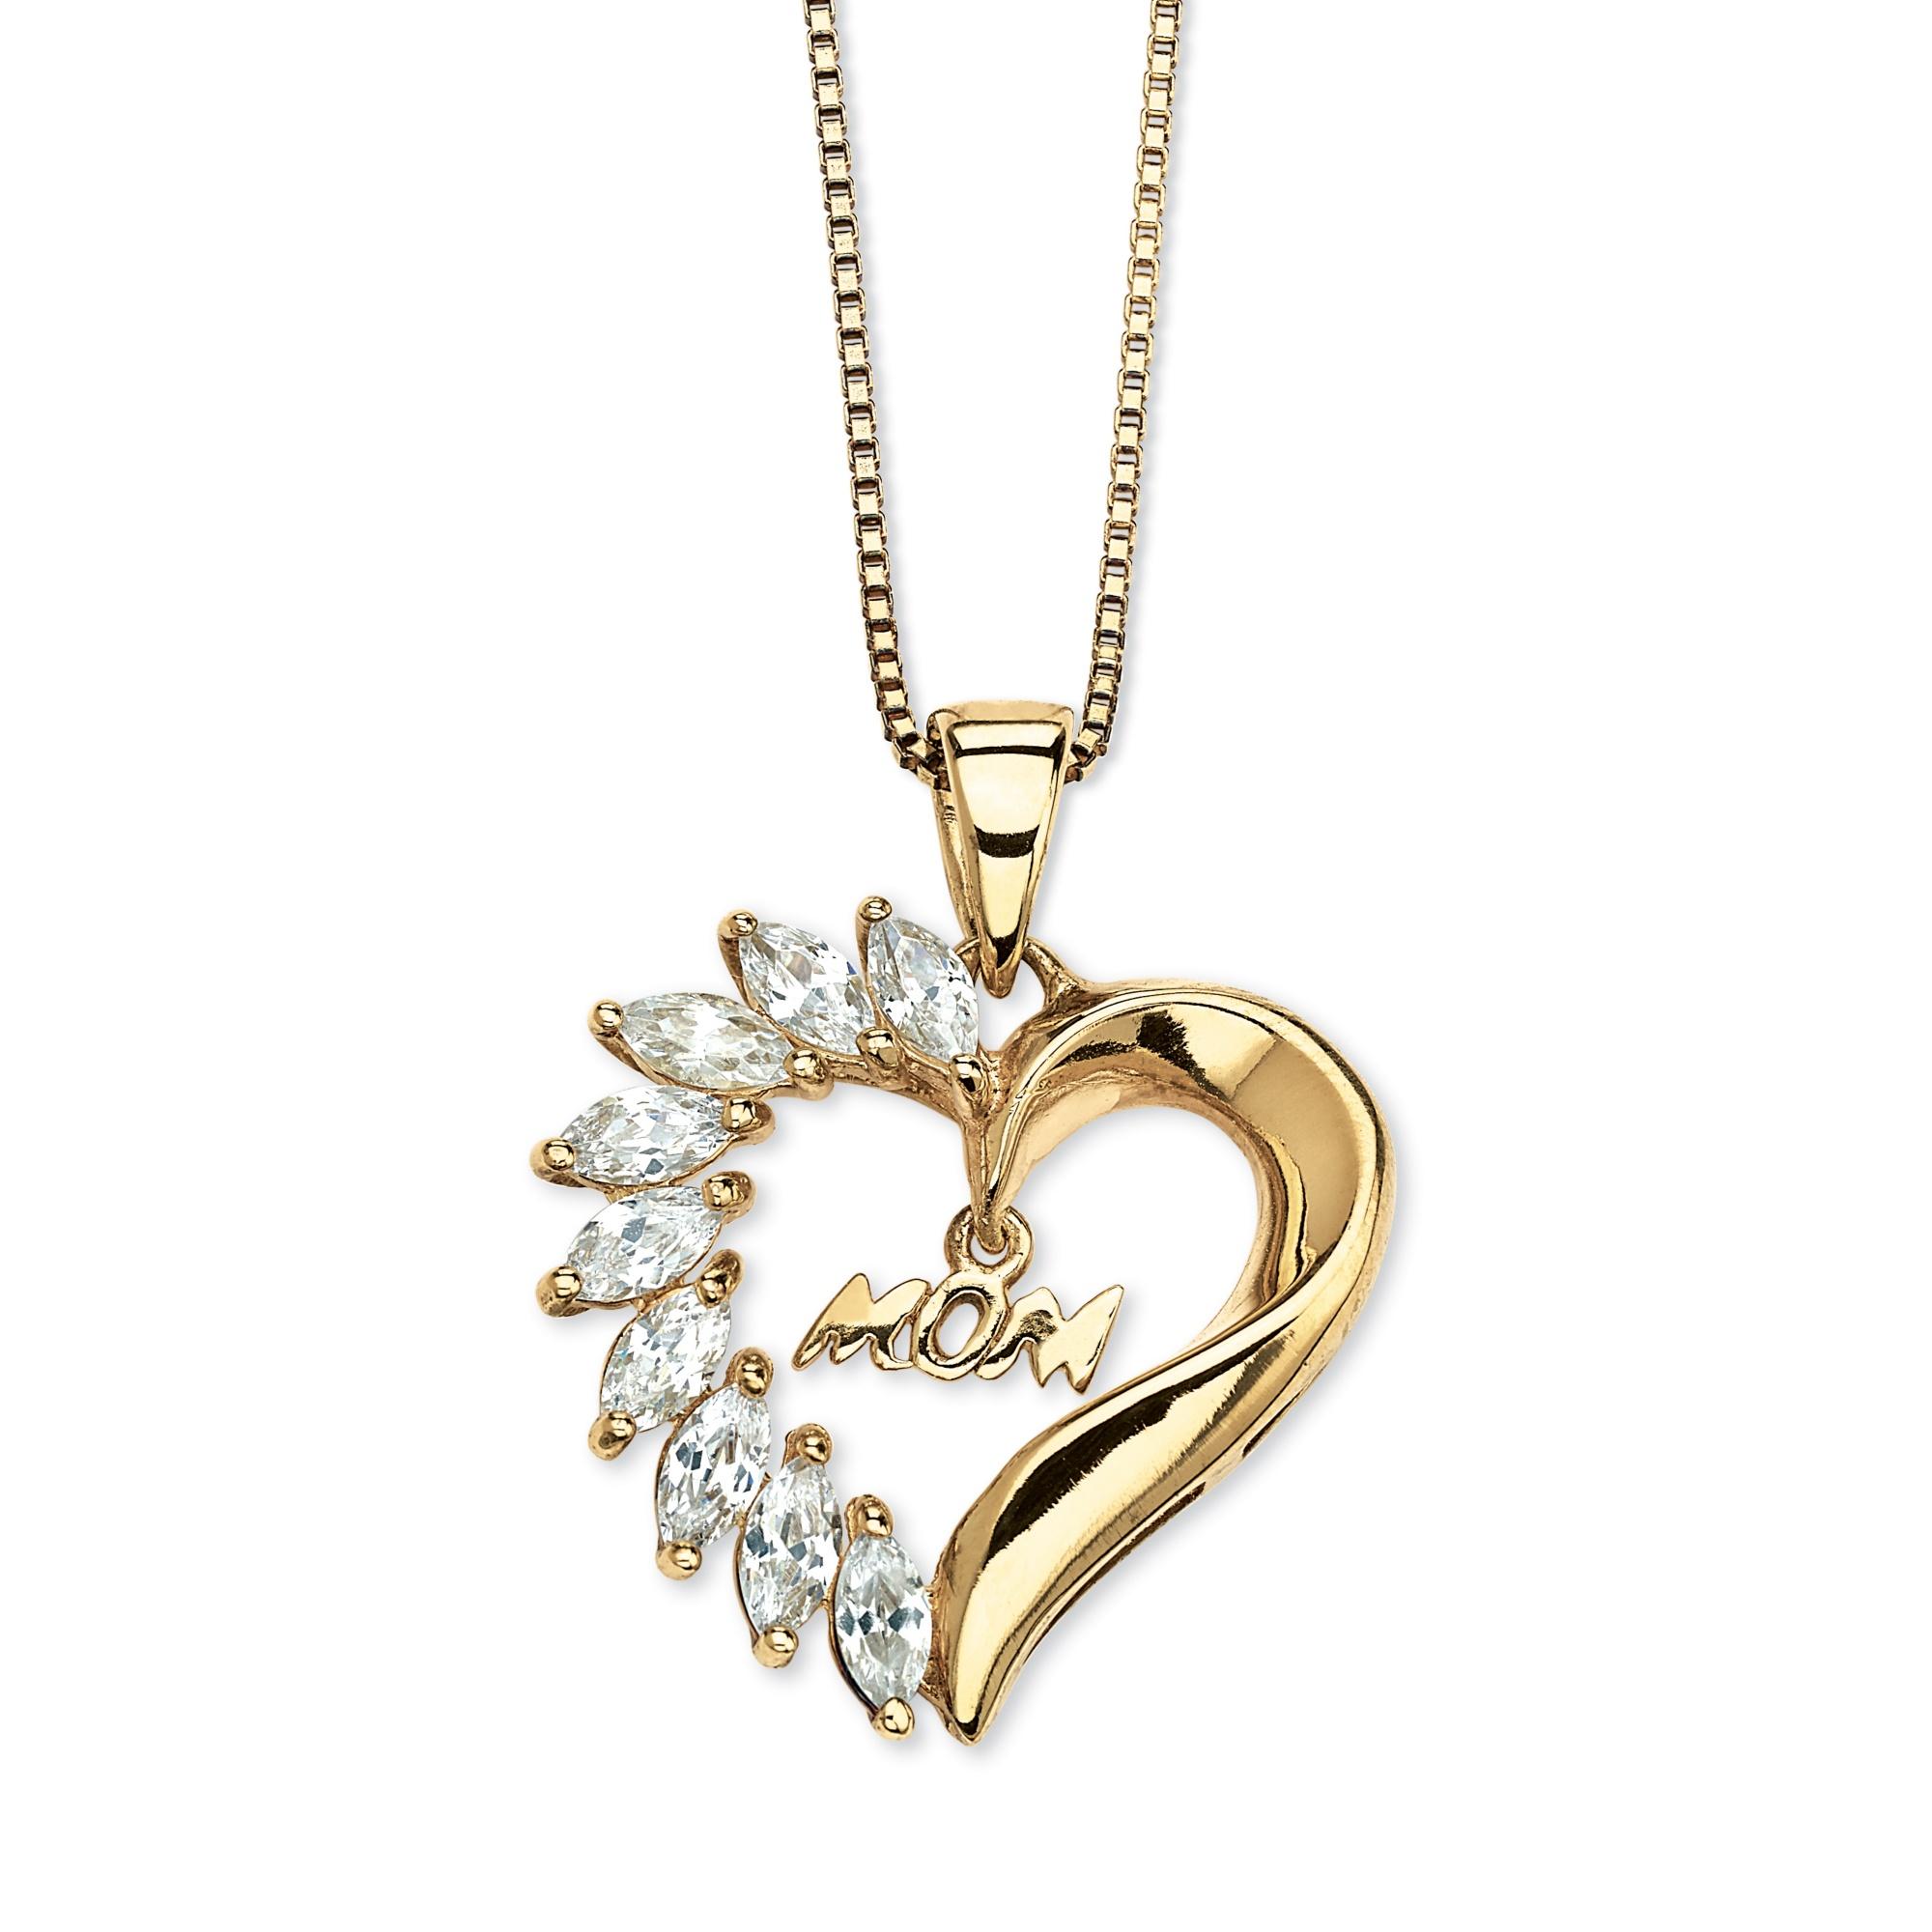 1 35 Tcw Cubic Zirconia Mom Heart Pendant Necklace In 18k